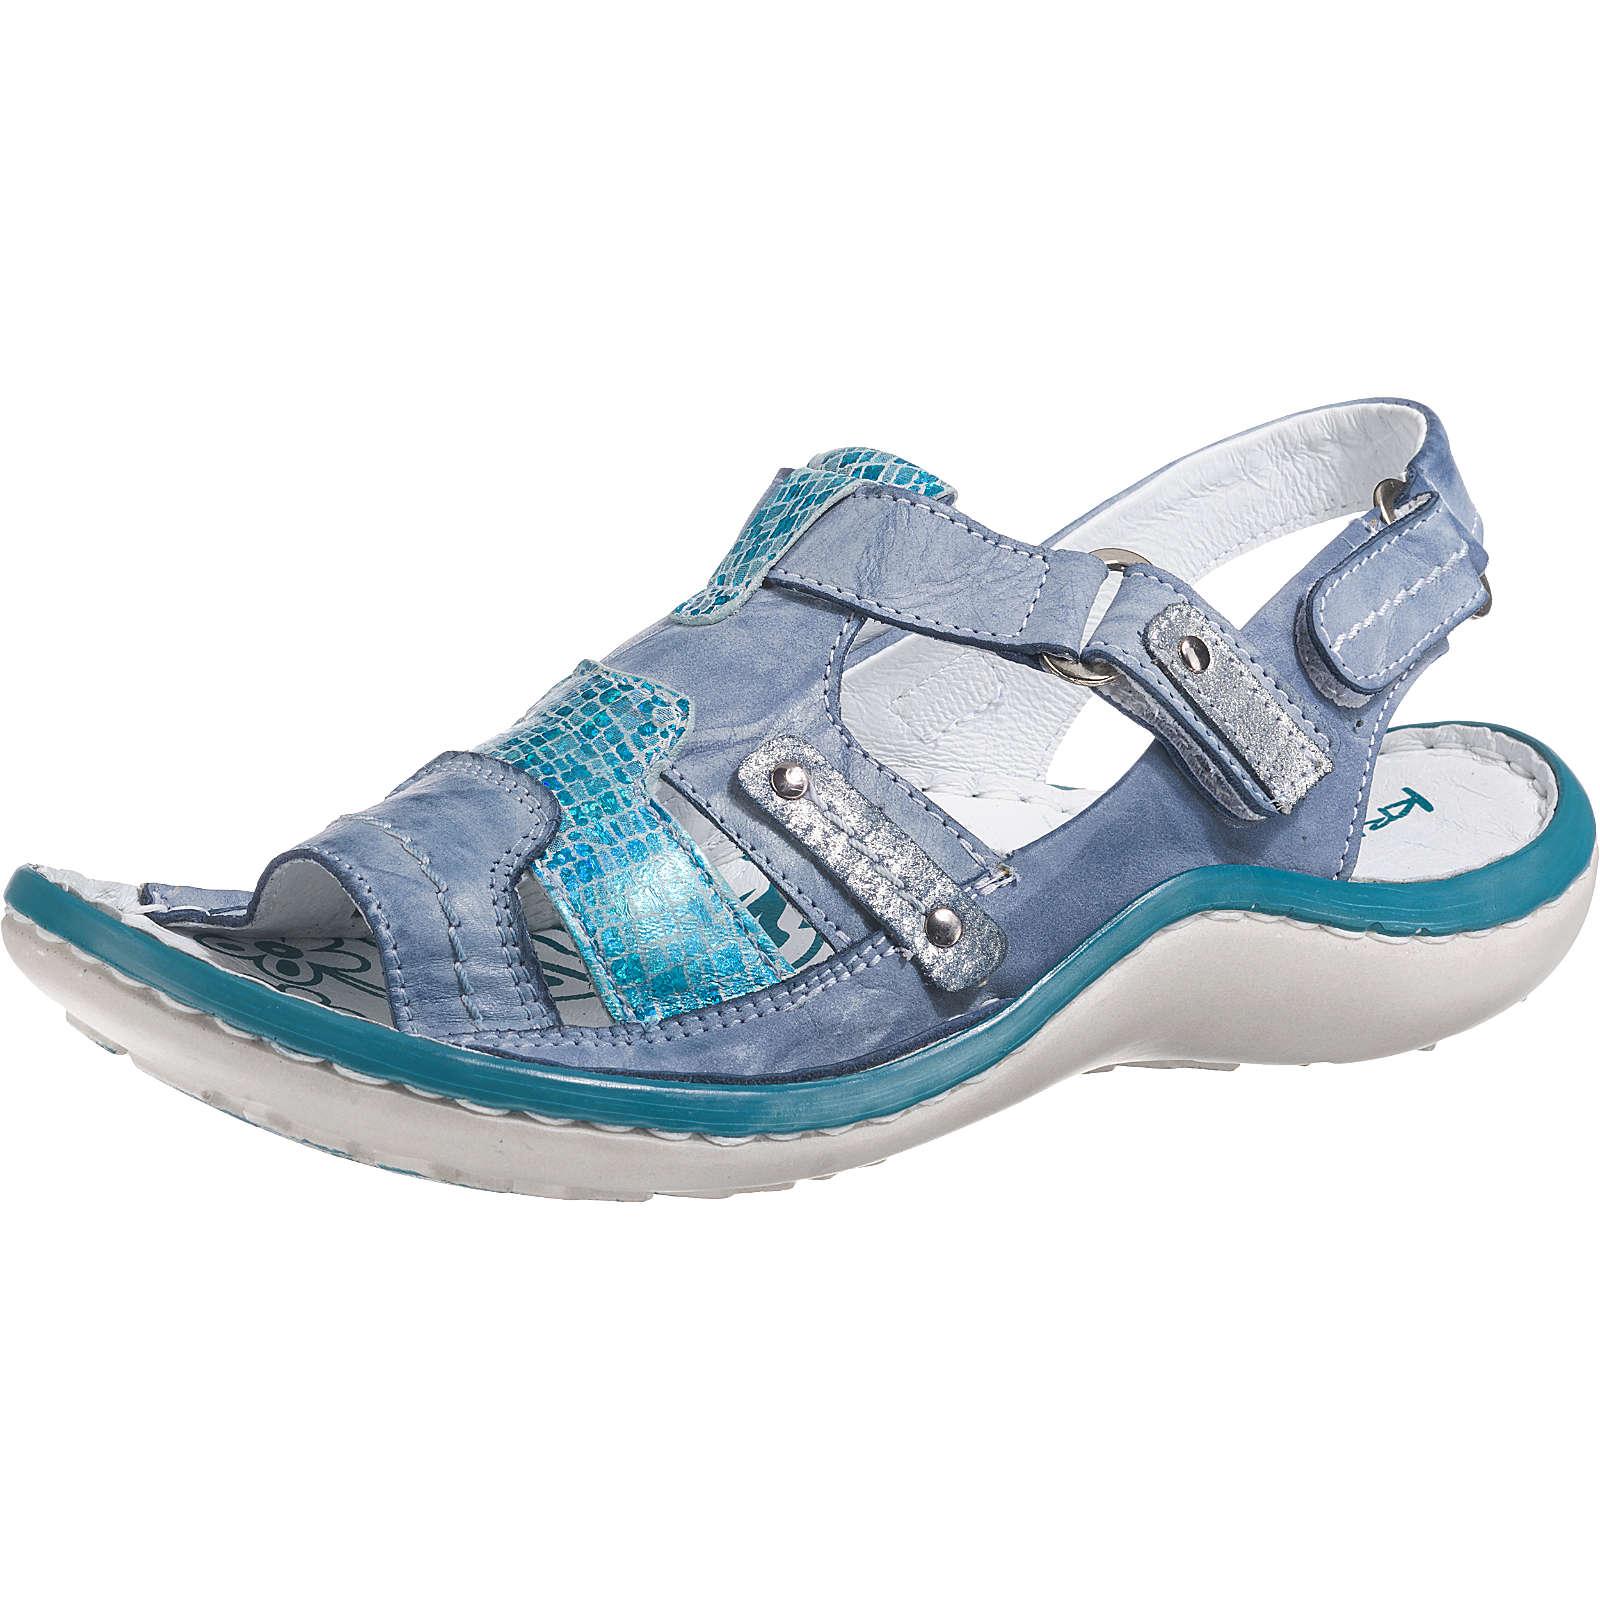 Krisbut Klassische Sandaletten blau Damen Gr. 37